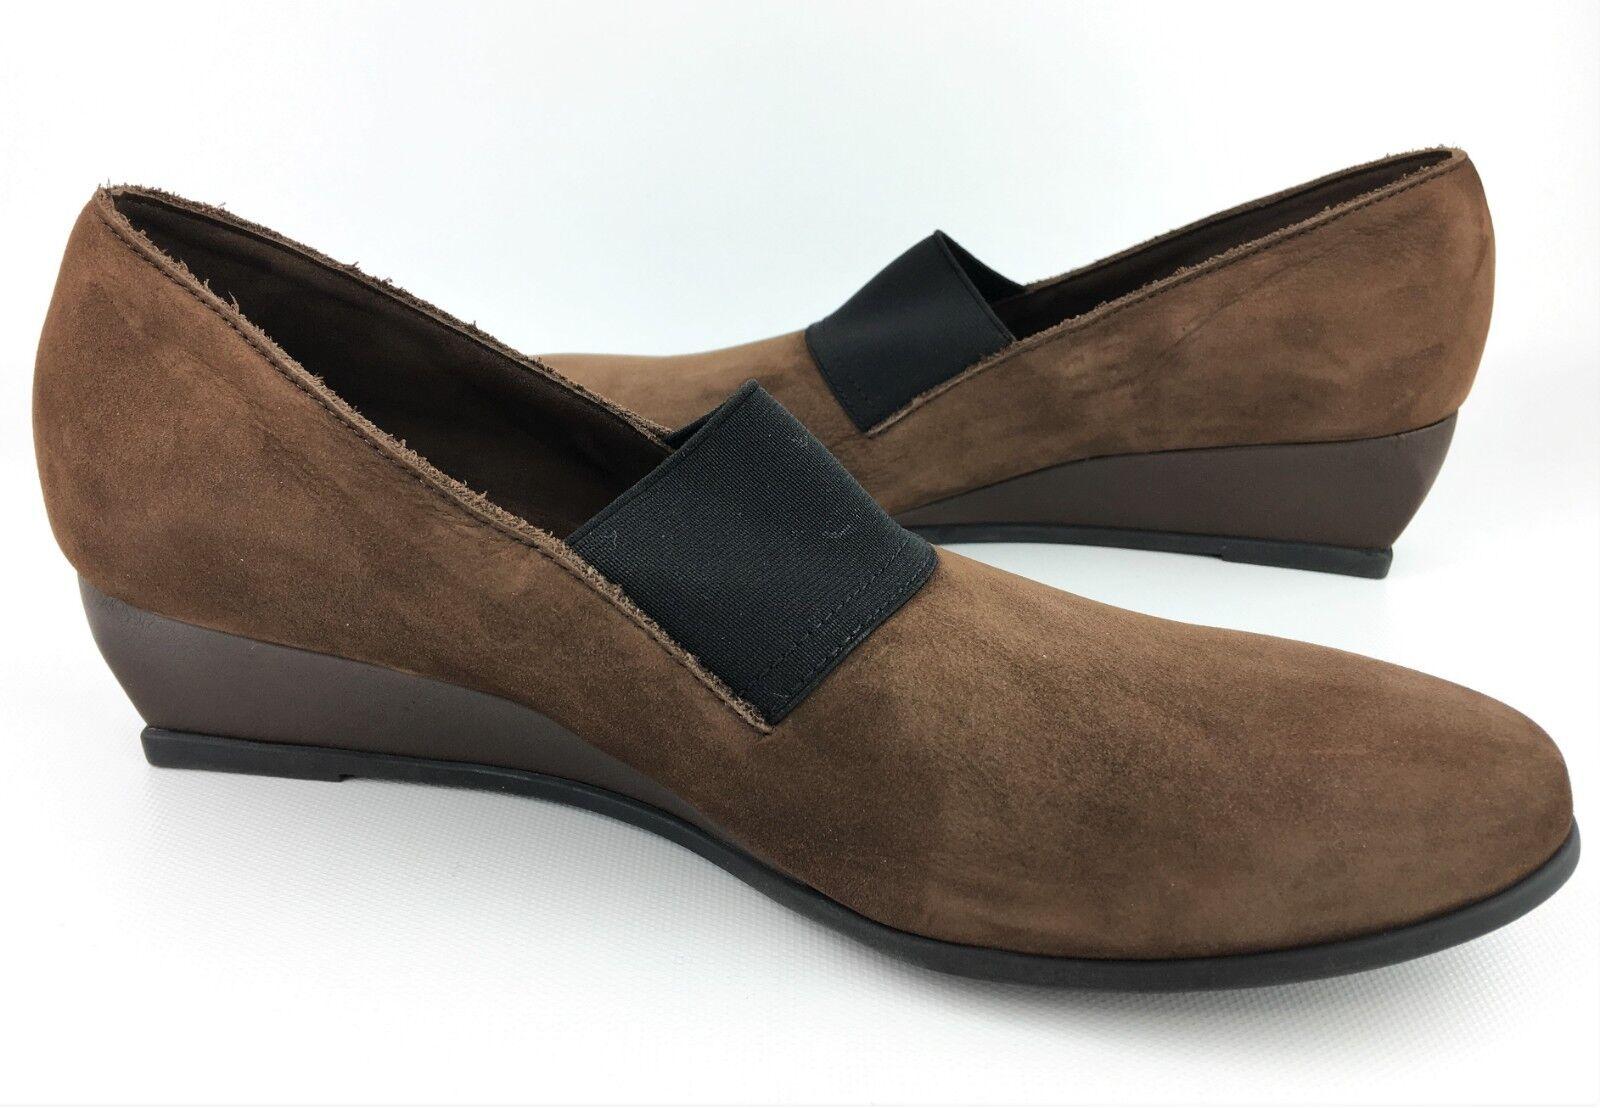 Arche 'Emyone' Brown Brown Brown Nubuck Slip-ons Wedge Pumps sz  37.5 US 6.5 -  365 203a52